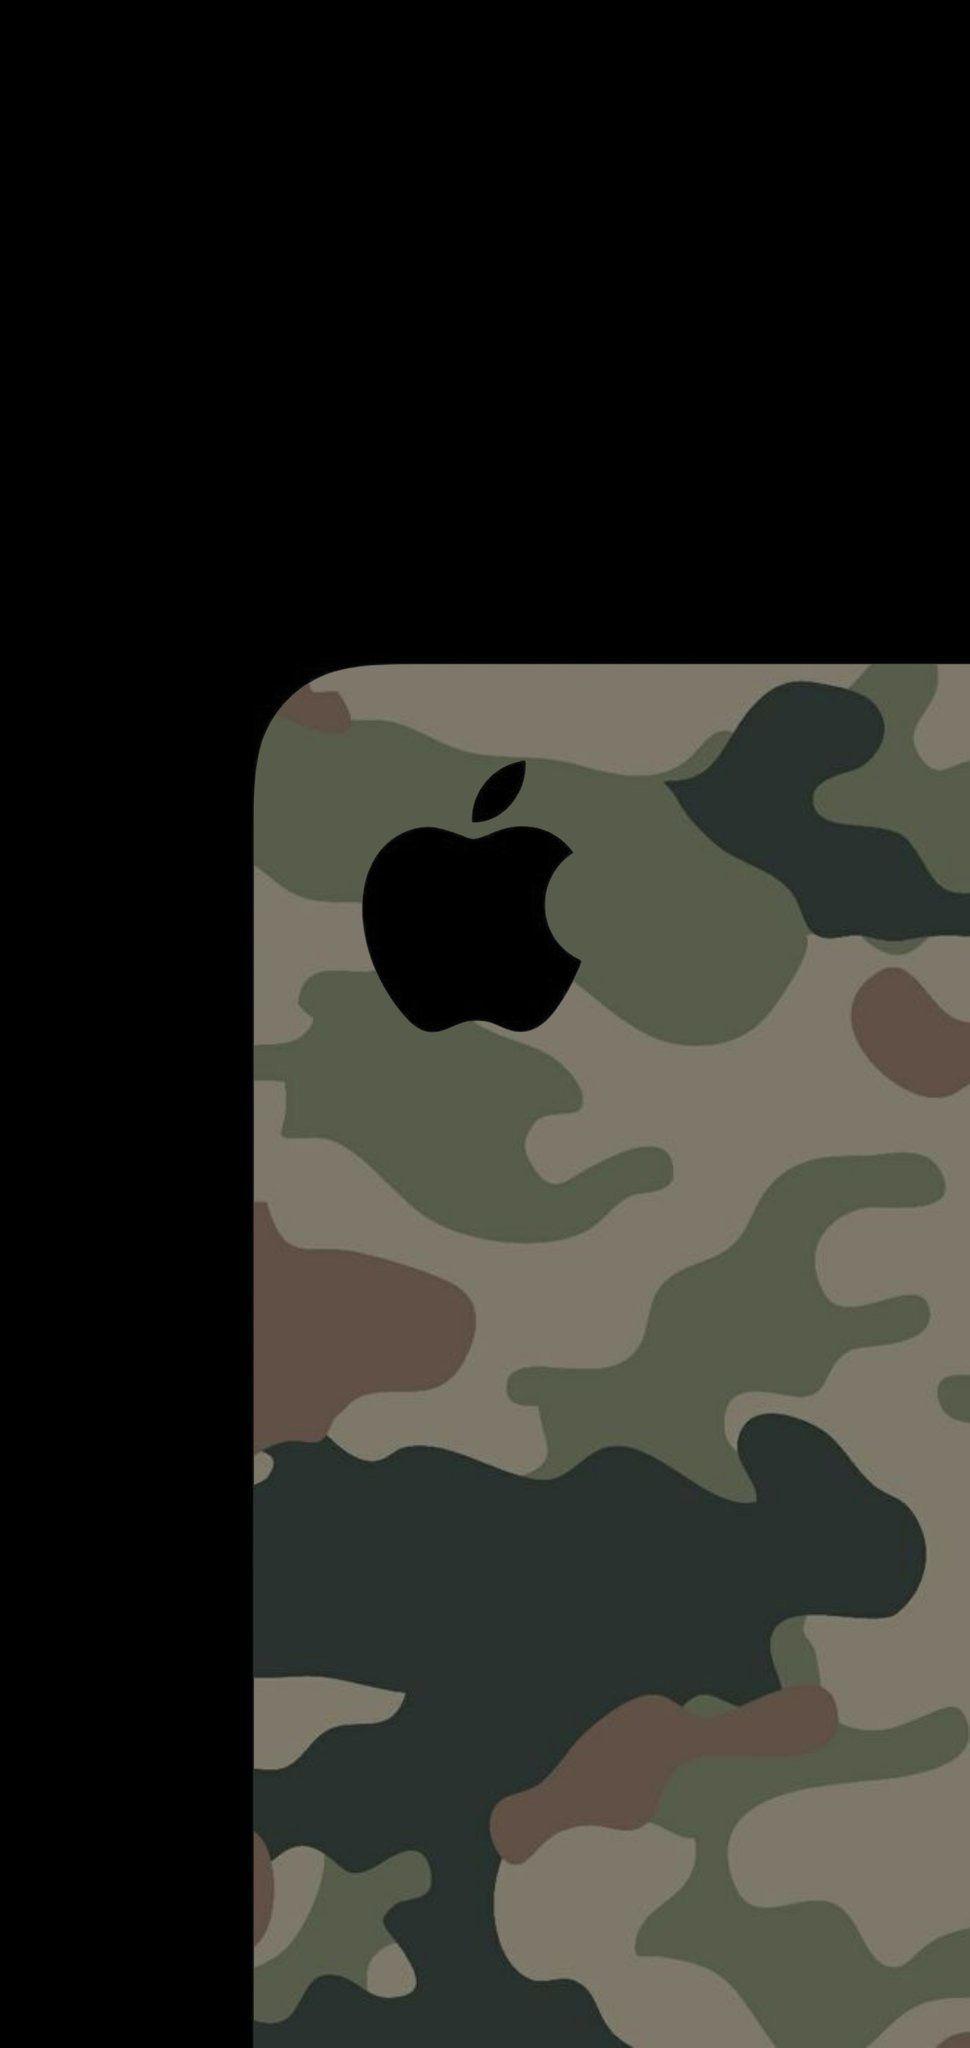 Apple Logo • Camouflage  #ios13wallpaper #iOS13 #iphonewallpaper #apple #logo #colorful #lockscreen #homescreen #iphonexr #iphonexs #iphone11 #iphone11pro #ios13wallpaper Apple Logo • Camouflage  #ios13wallpaper #iOS13 #iphonewallpaper #apple #logo #colorful #lockscreen #homescreen #iphonexr #iphonexs #iphone11 #iphone11pro #ios13wallpaper Apple Logo • Camouflage  #ios13wallpaper #iOS13 #iphonewallpaper #apple #logo #colorful #lockscreen #homescreen #iphonexr #iphonexs #iphone11 #iphone11p #ios13wallpaper